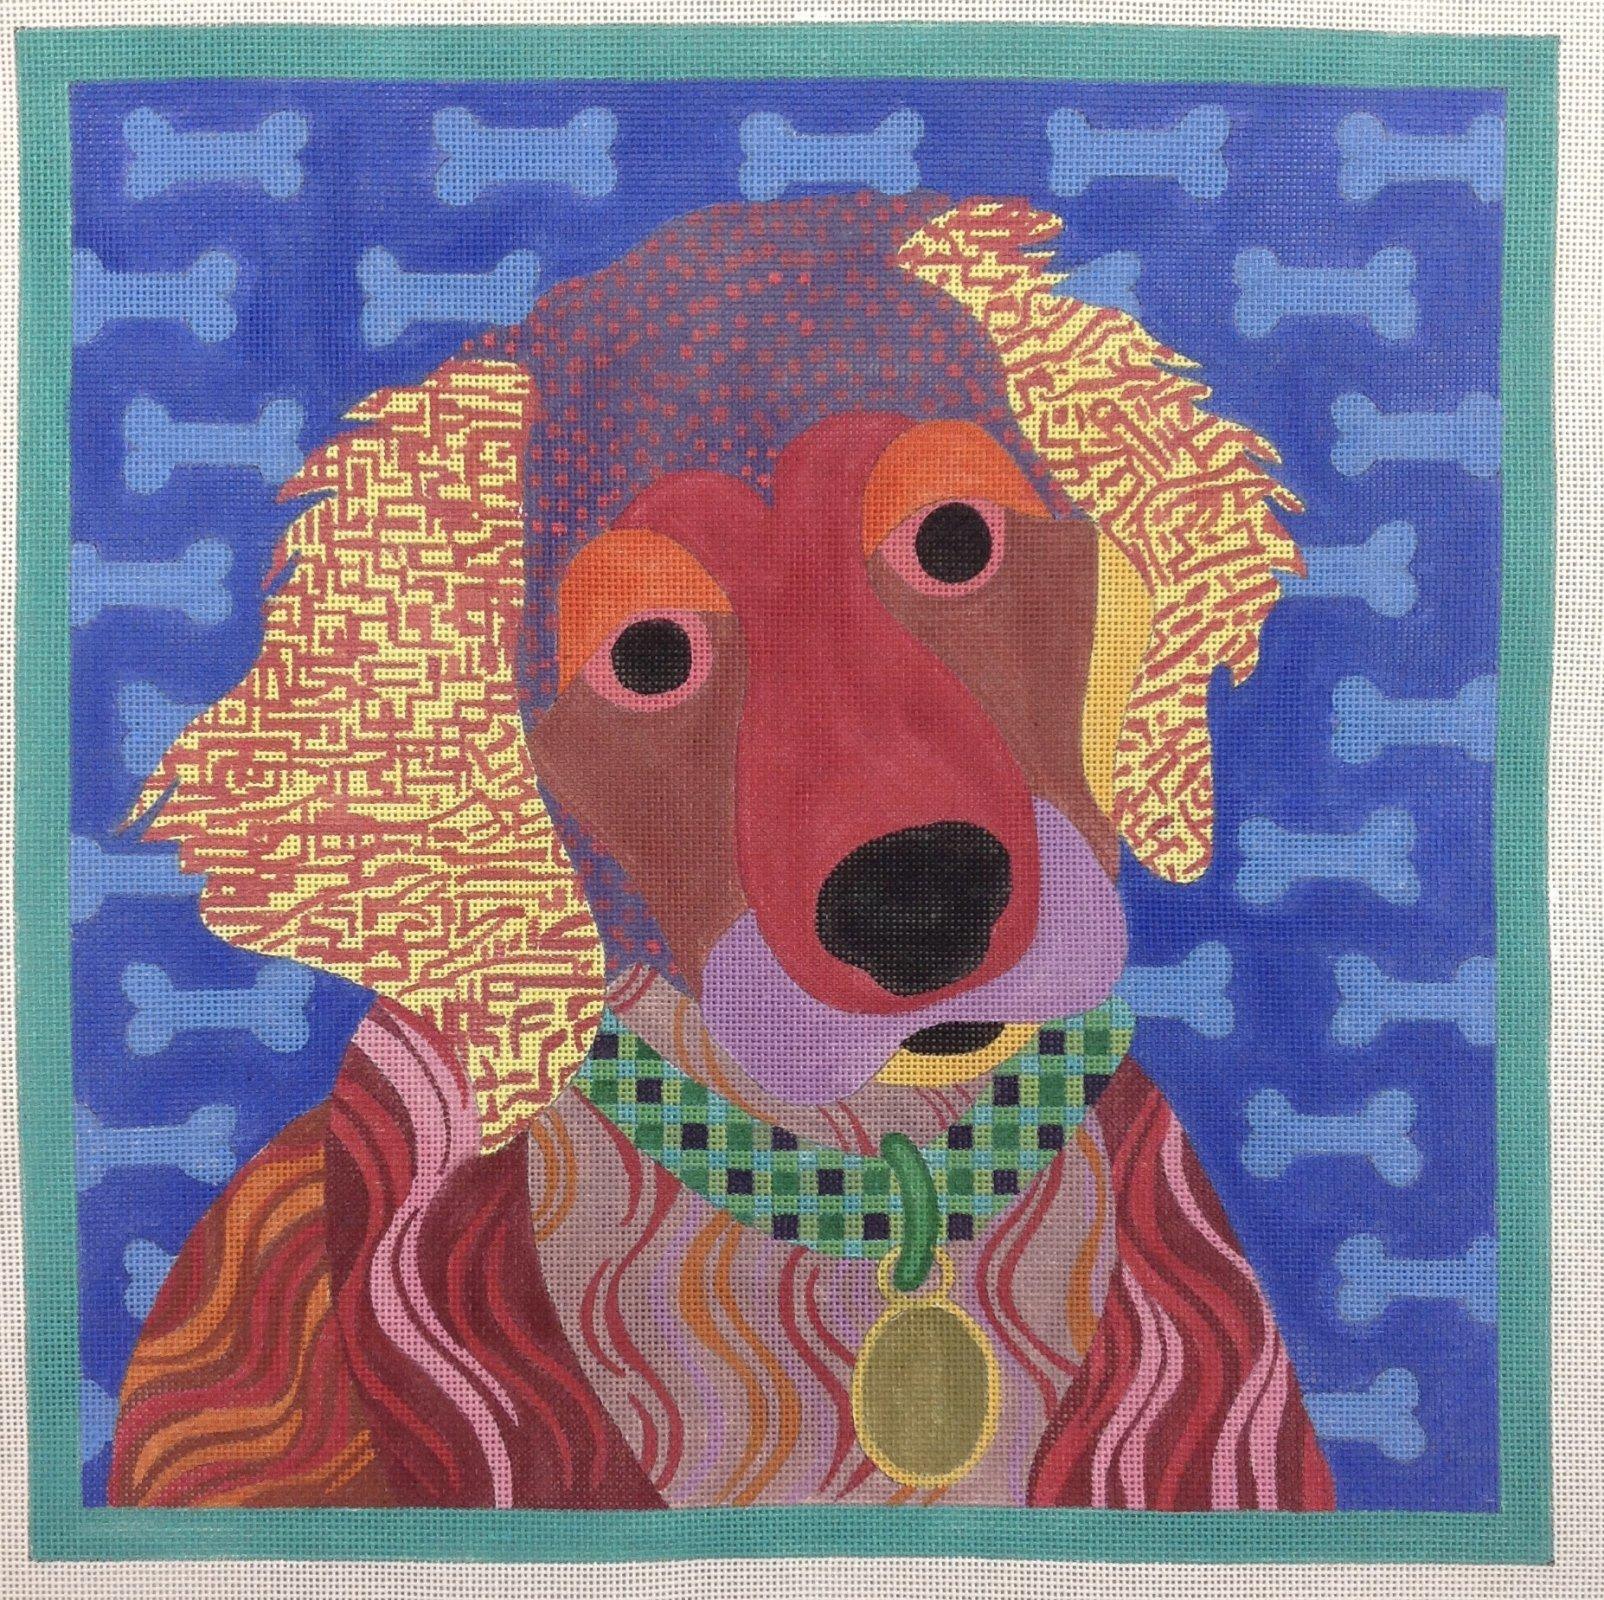 patchwork brown dog